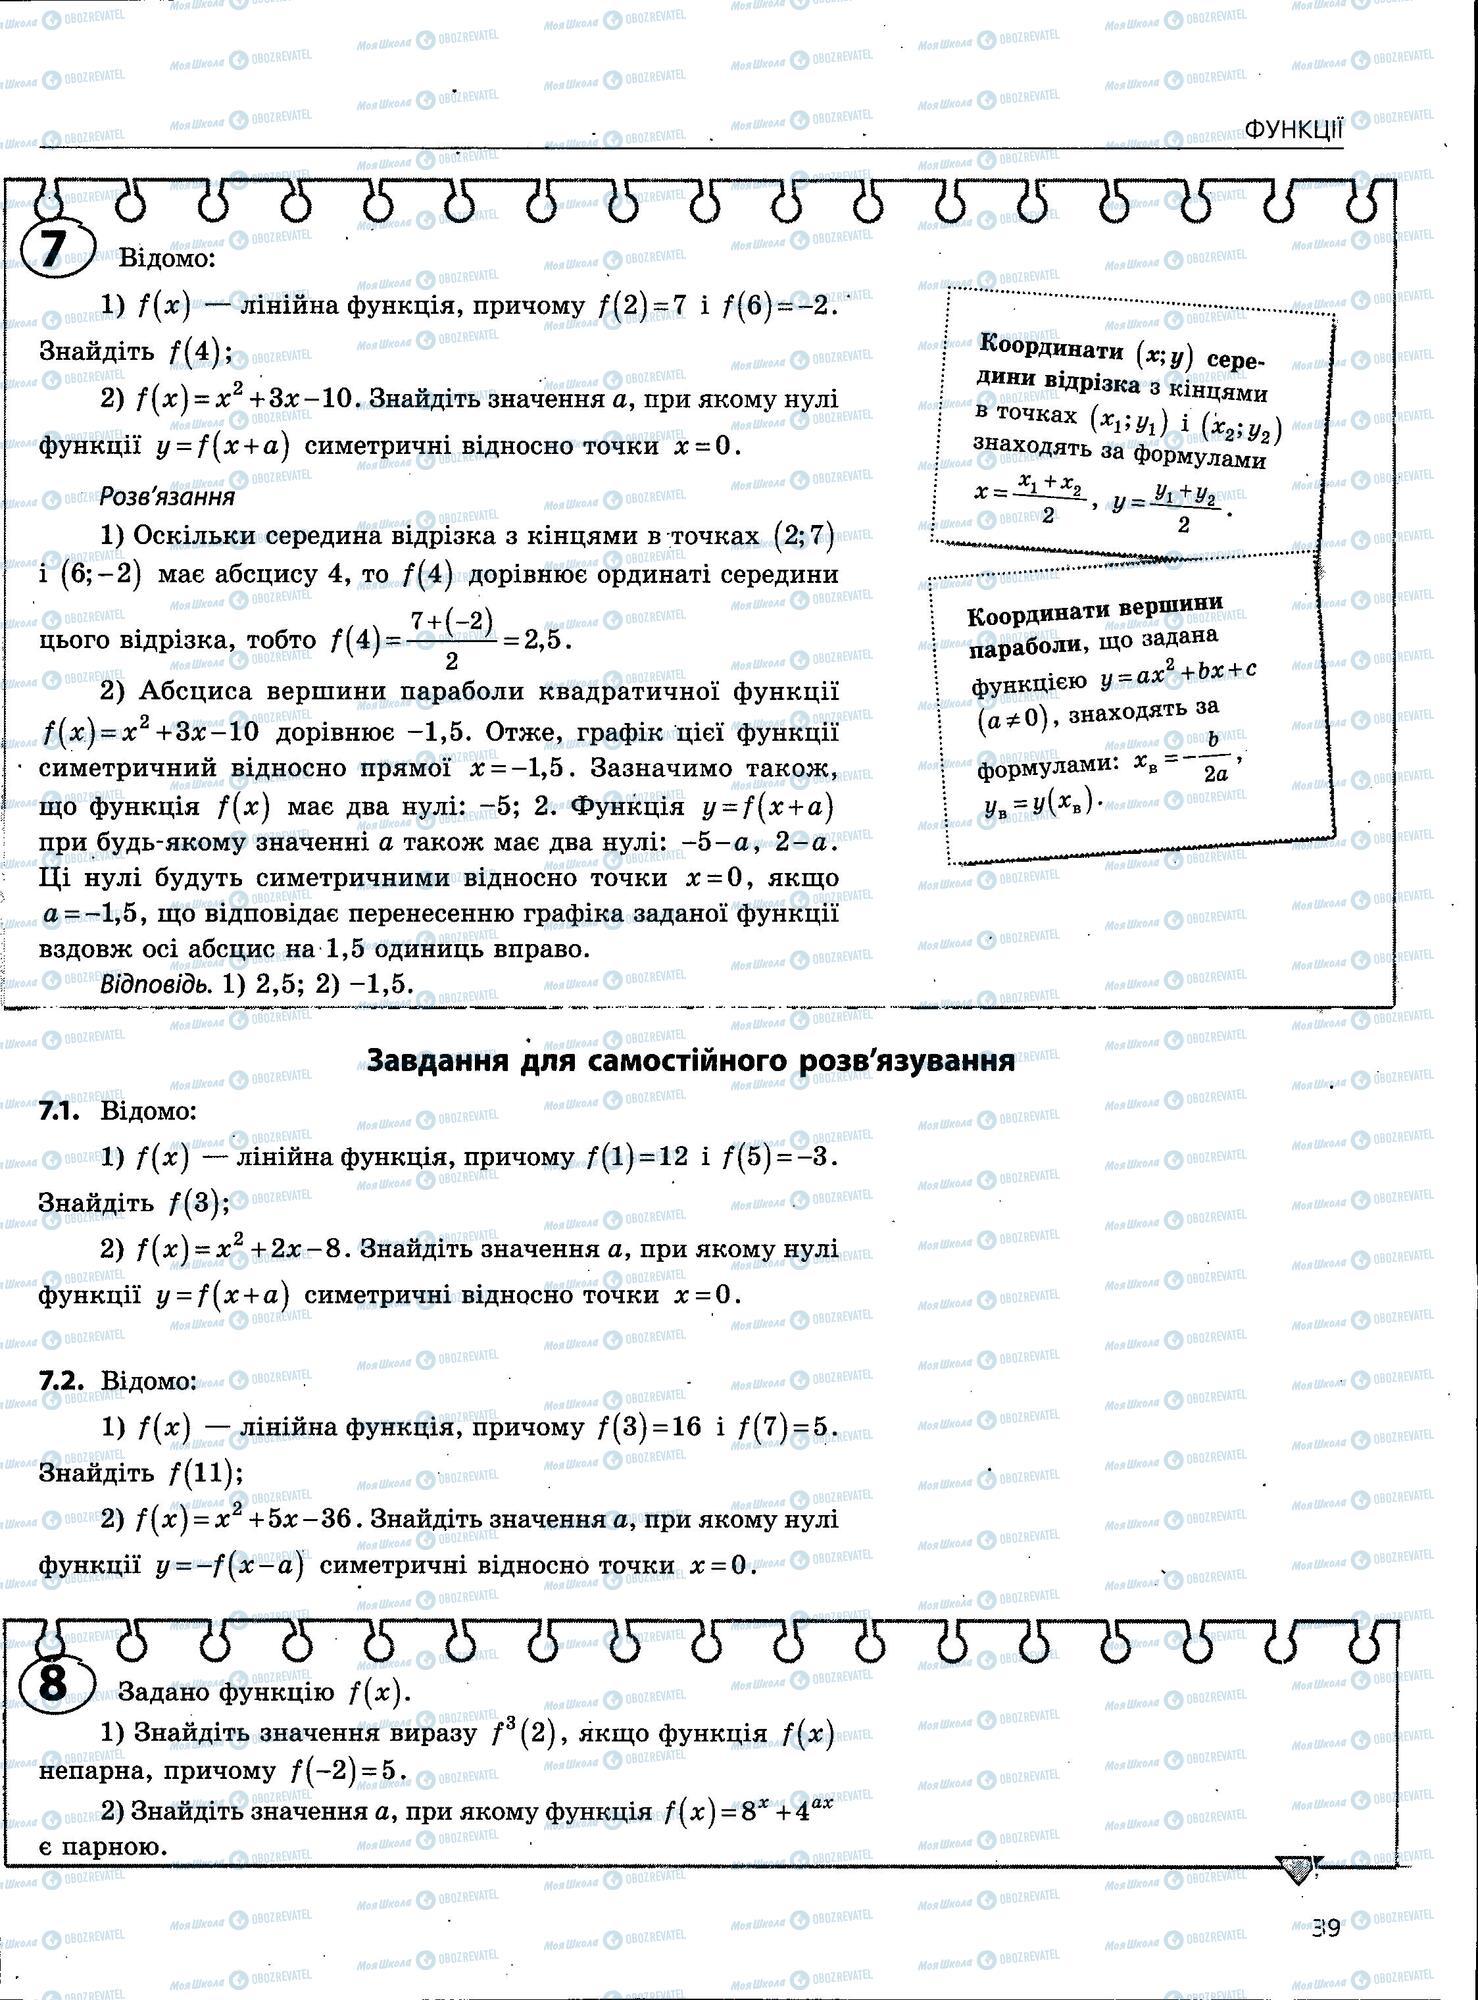 ЗНО Математика 11 класс страница 39